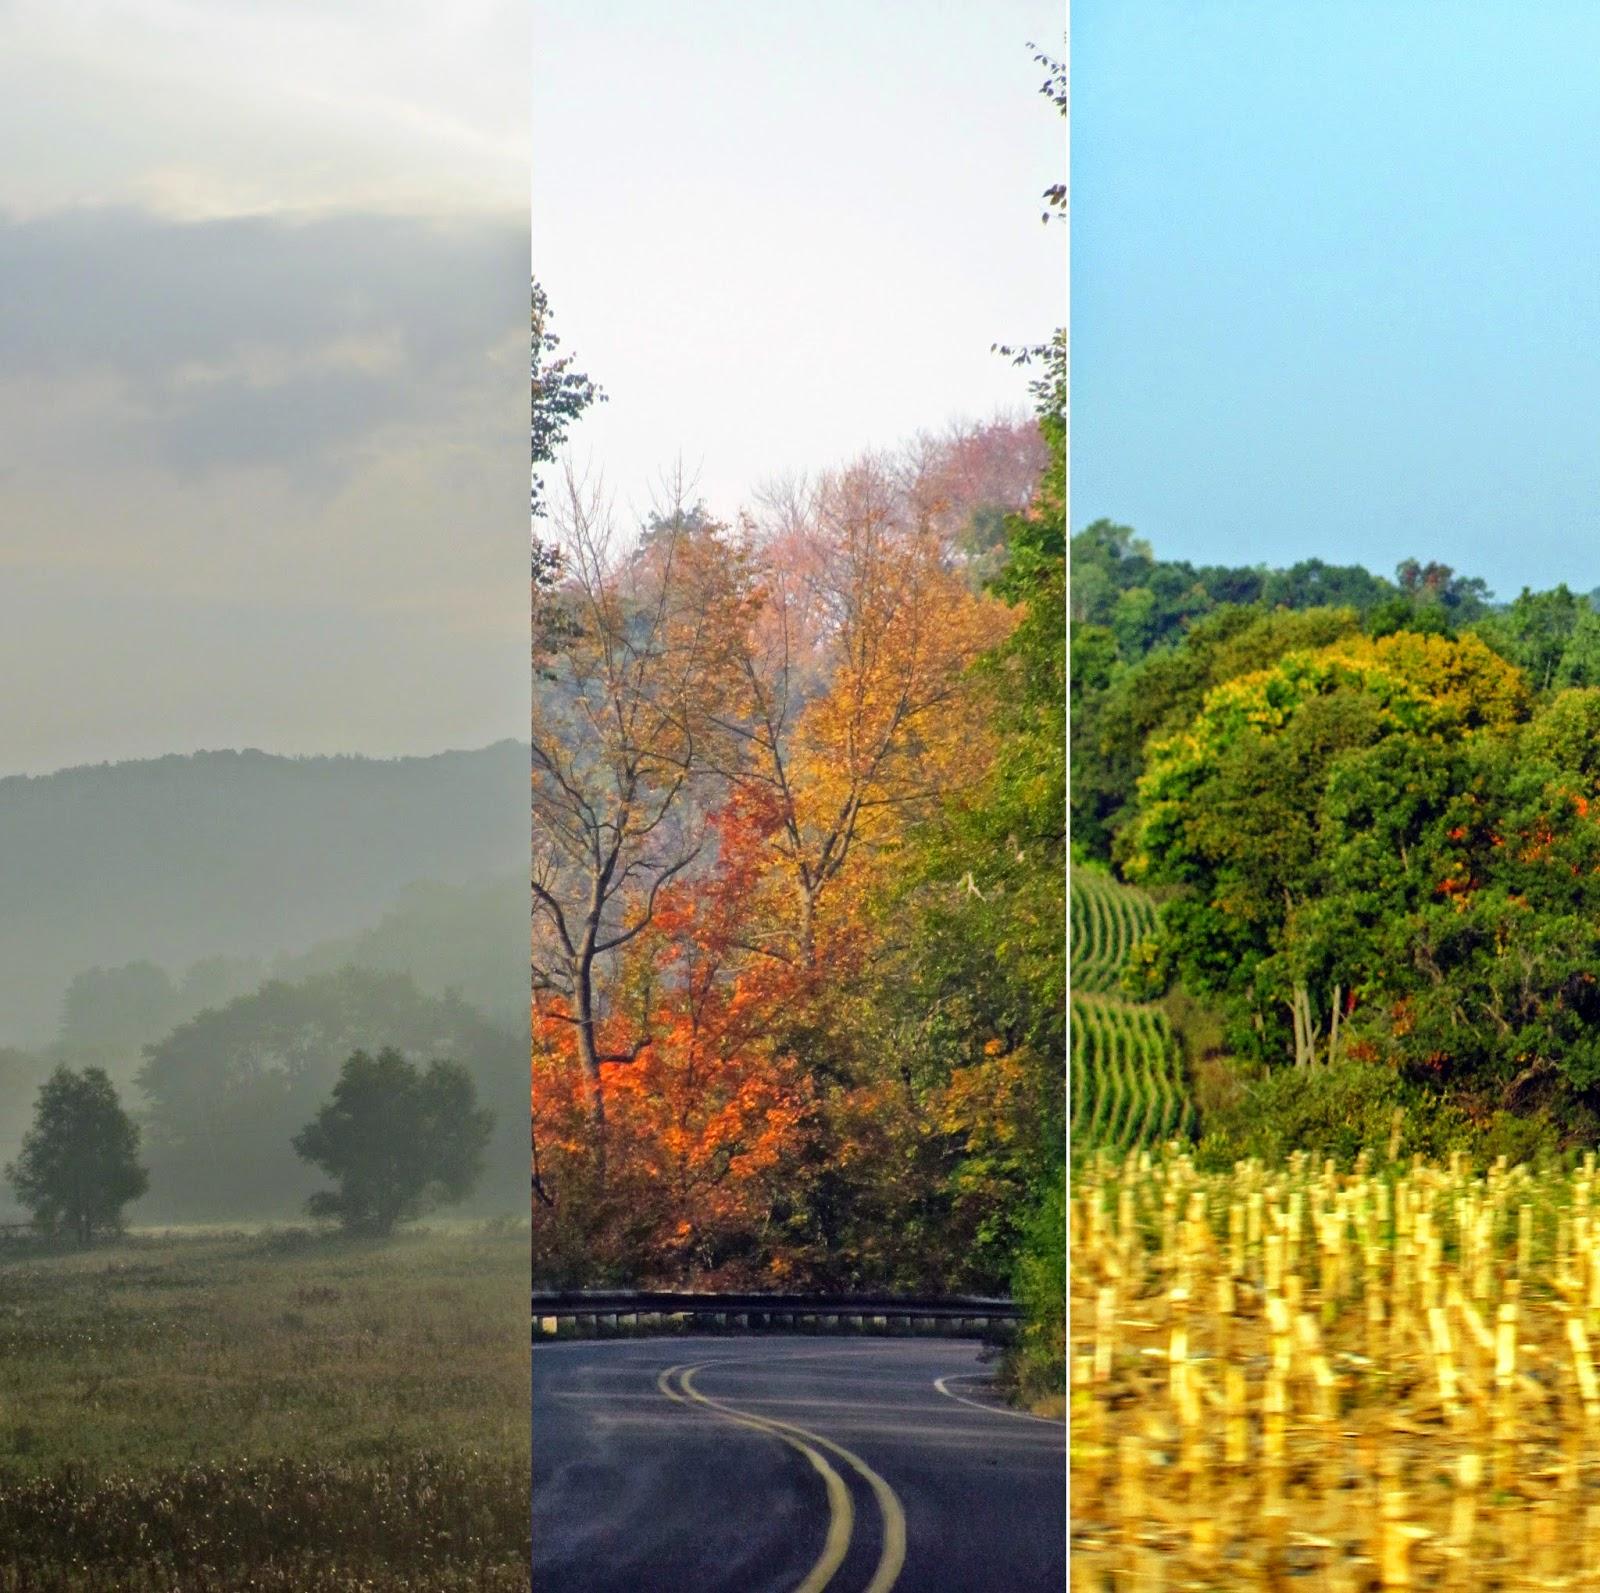 http://ichoosejoy2day.blogspot.com/2014/09/fall-traditions.html#more